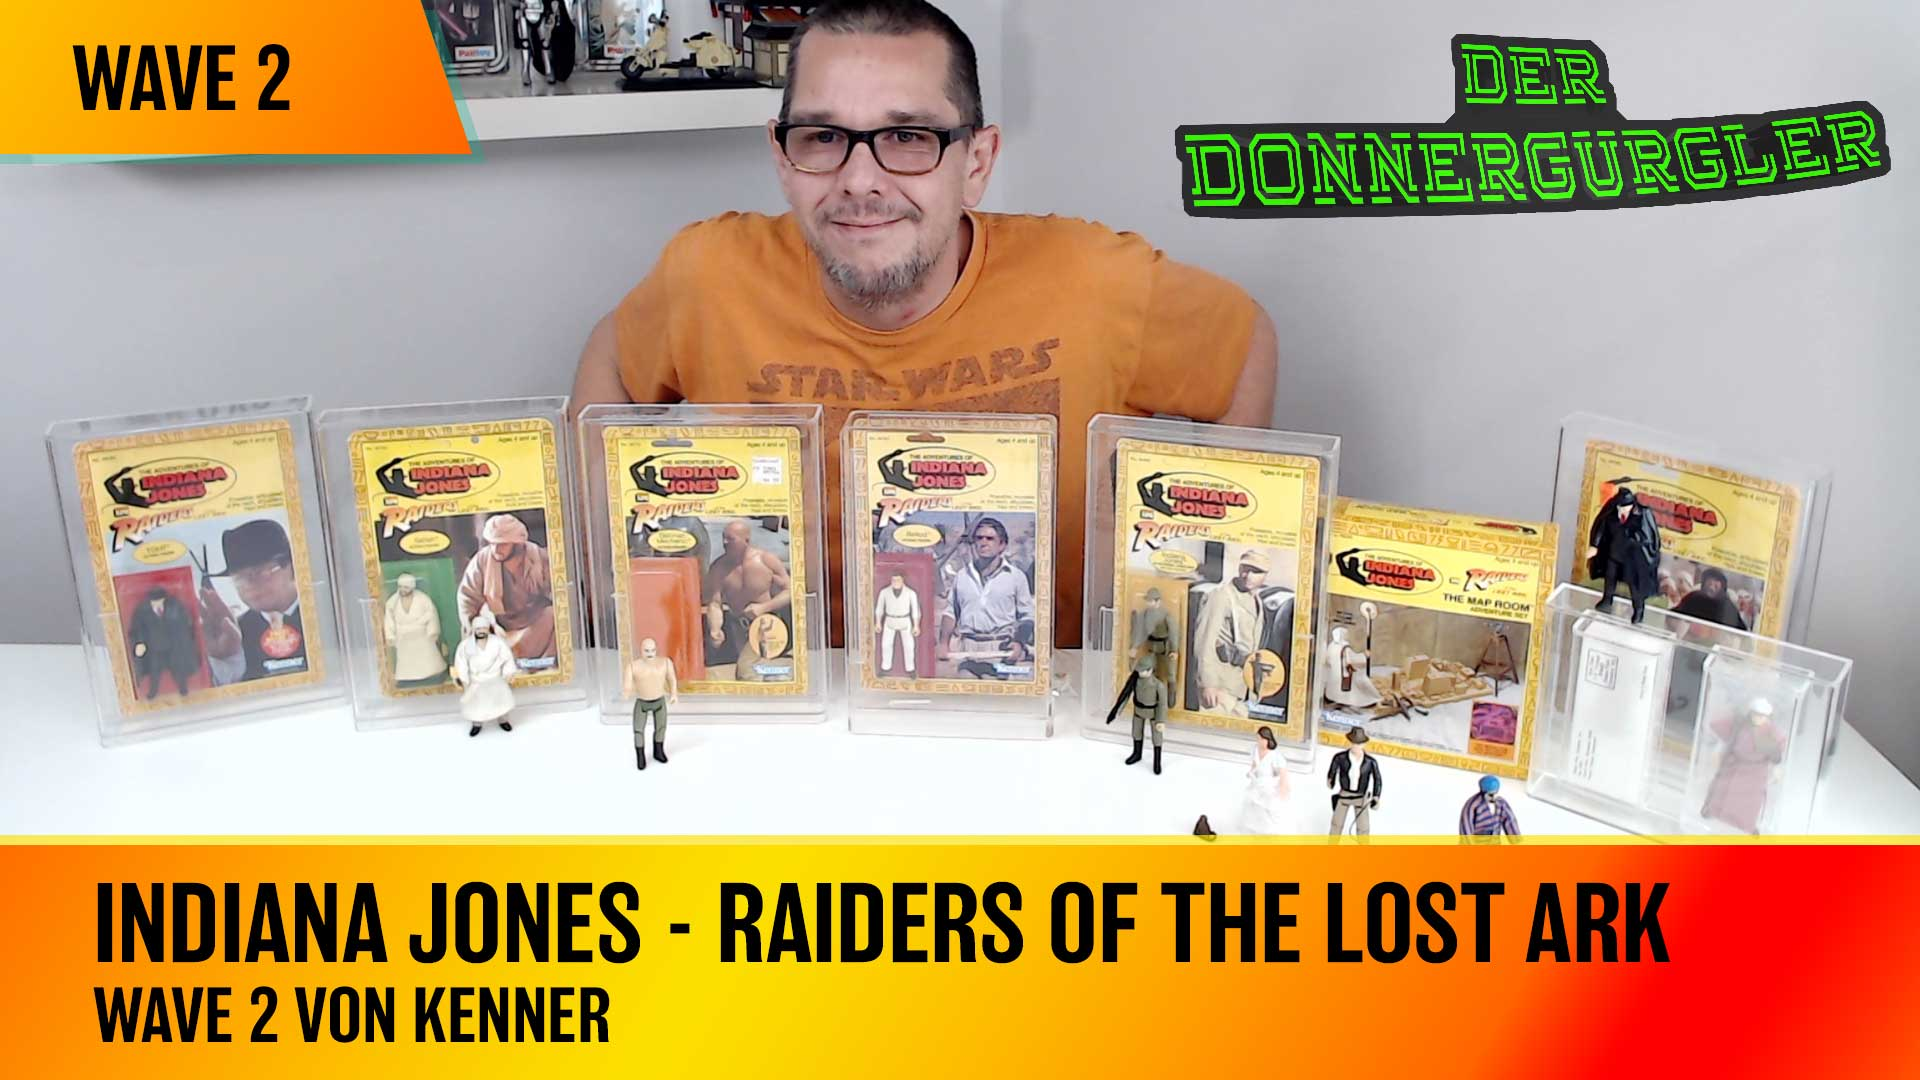 Wave 2 - Indiana Jones - Raiders of the Lost Ark von Kenner